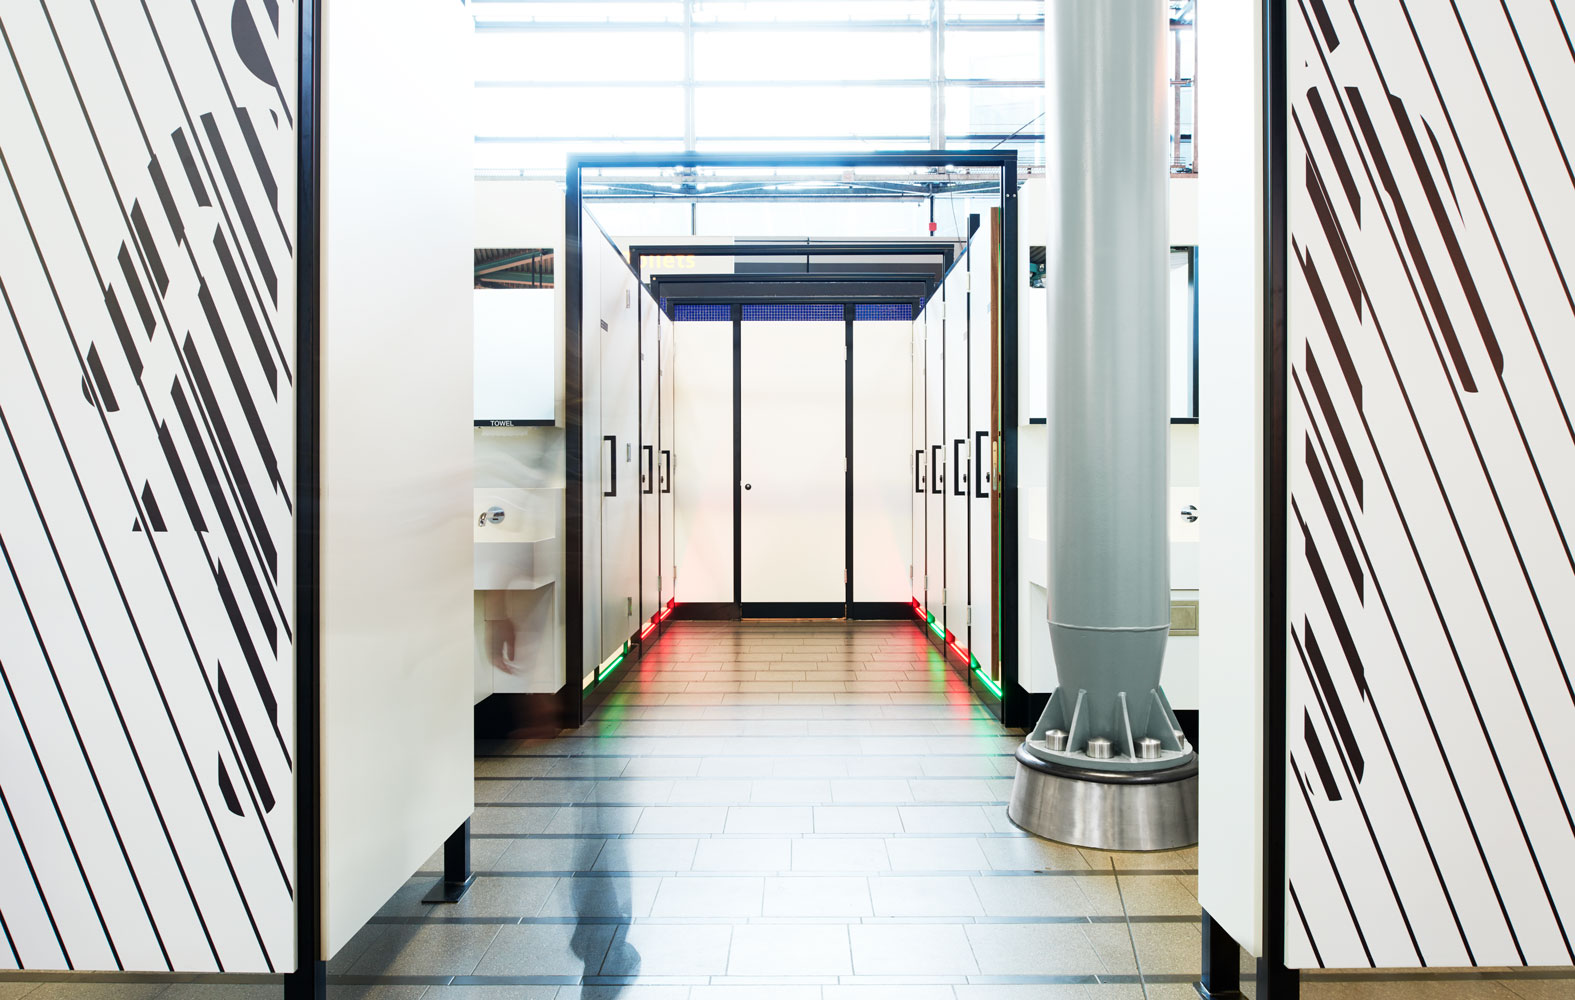 StudioErnst-PlugPlee-wandgrafiek-Schiphol-Airport4